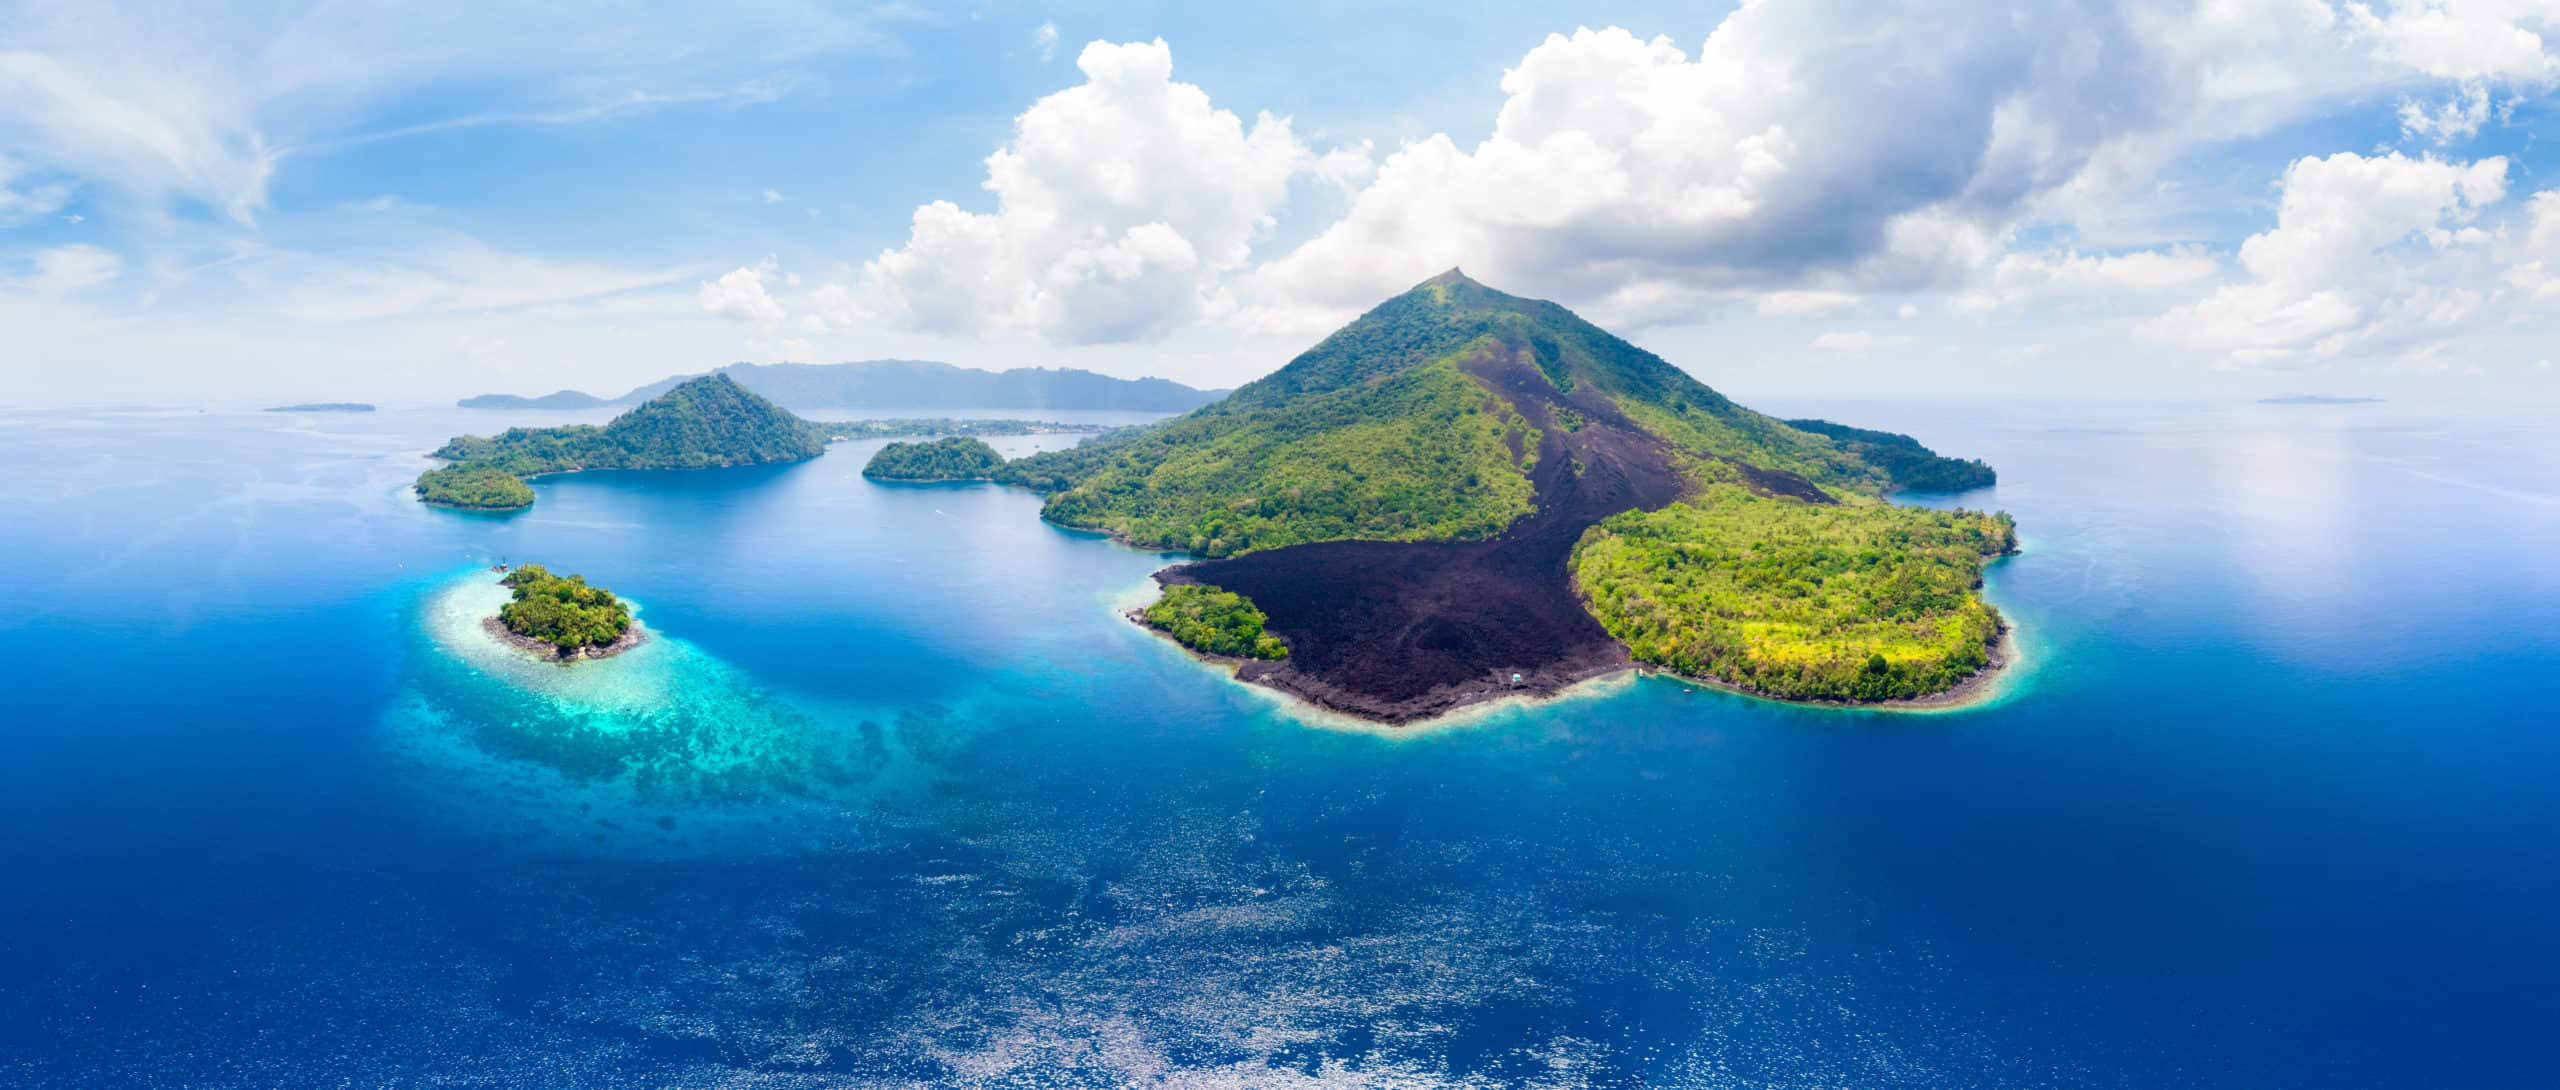 30 Amazing Islands to Visit With Wild Animals